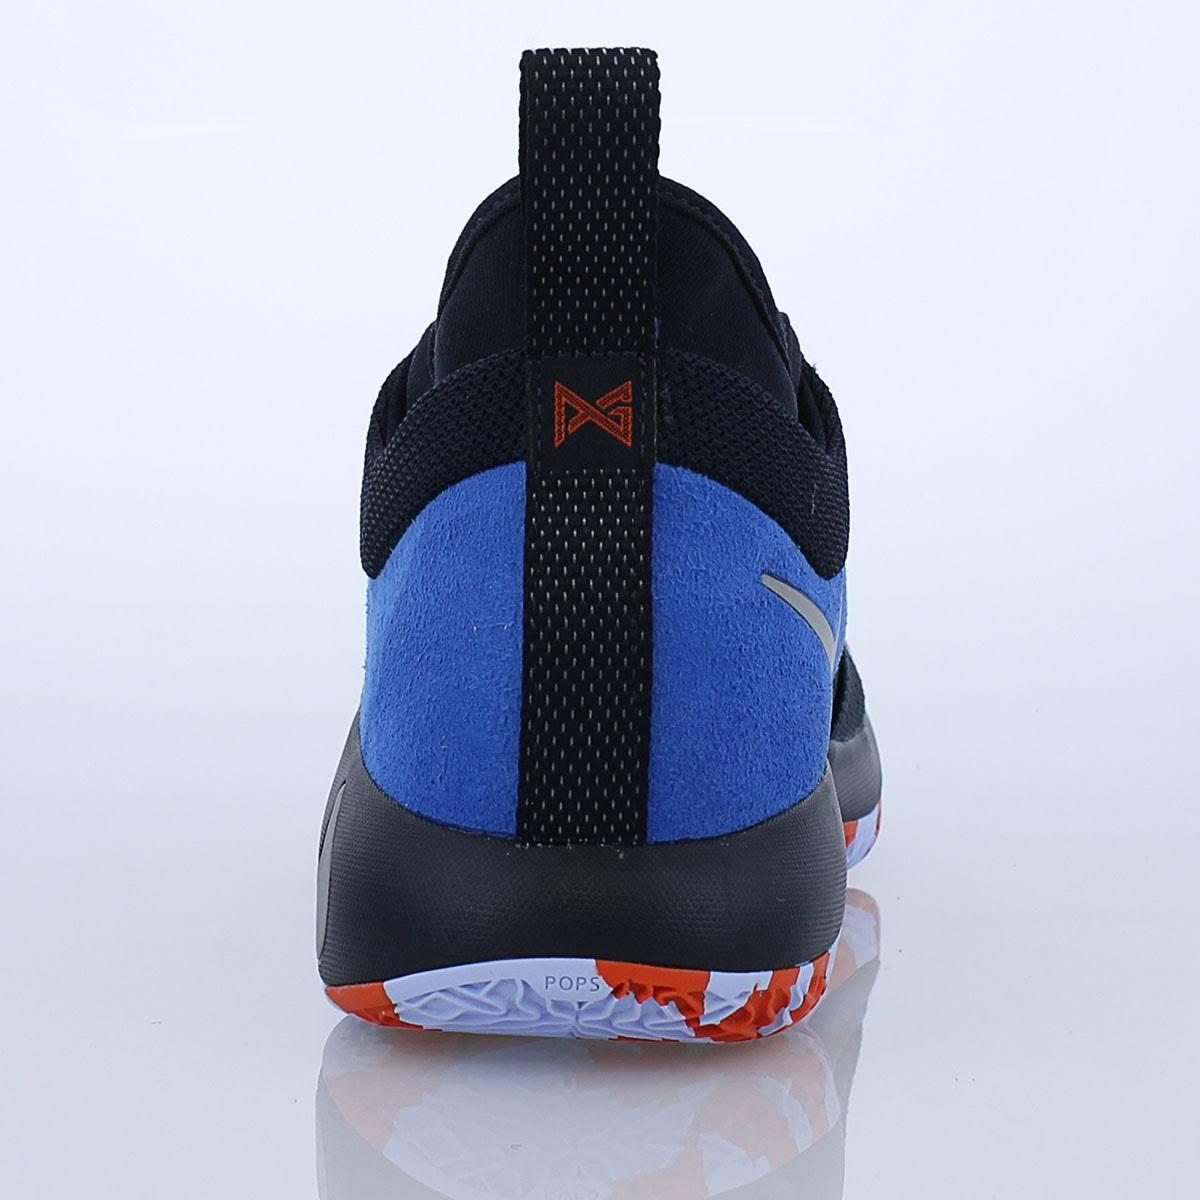 Home Craze 400 Aj2039 11 2 Obsidian Pg Us Nike EqnURFBB